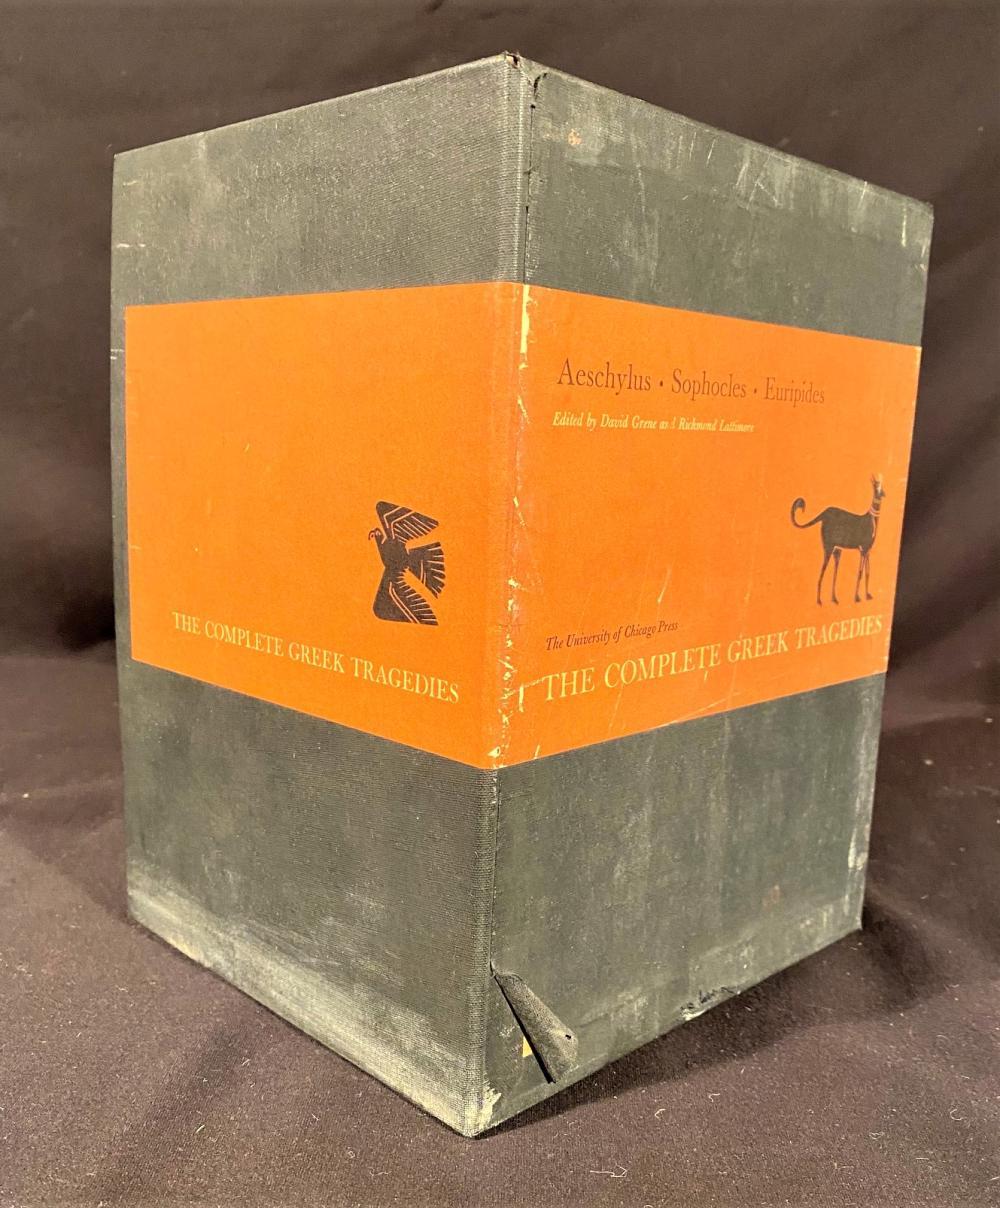 THE COMPLETE GREEK TRAGEDIES - 4 VOLUME BOX SET - 1959